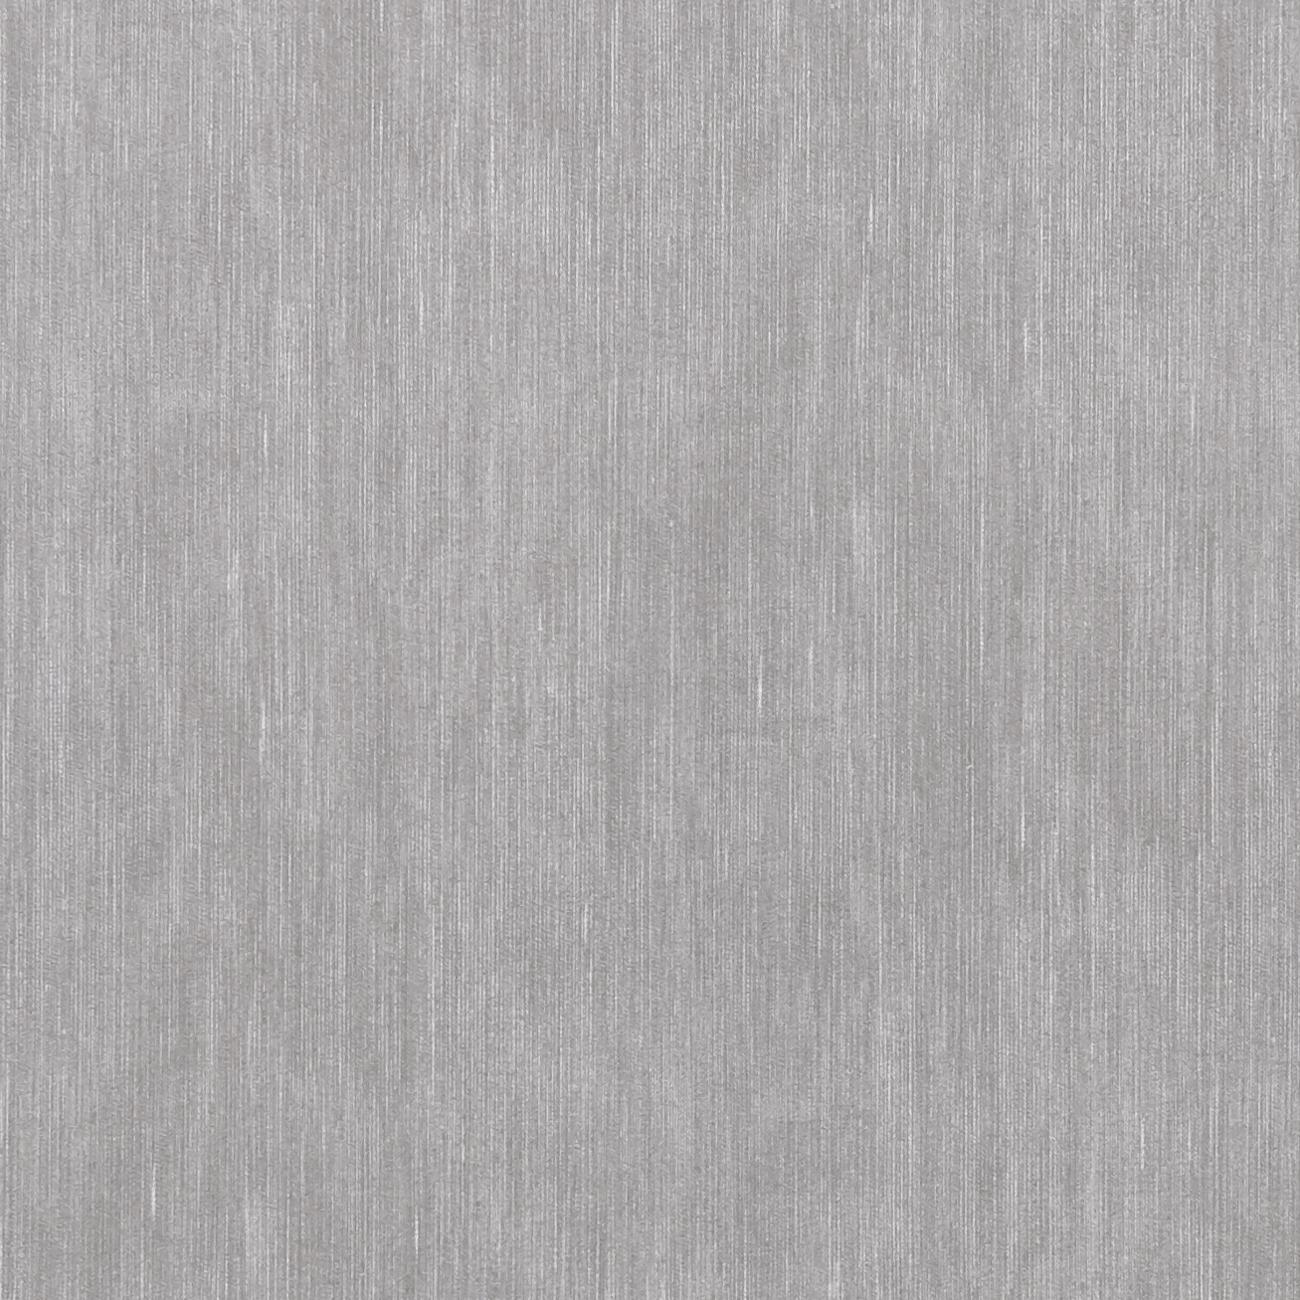 METALLICA F1200/18 | CLARKE & CLARKE